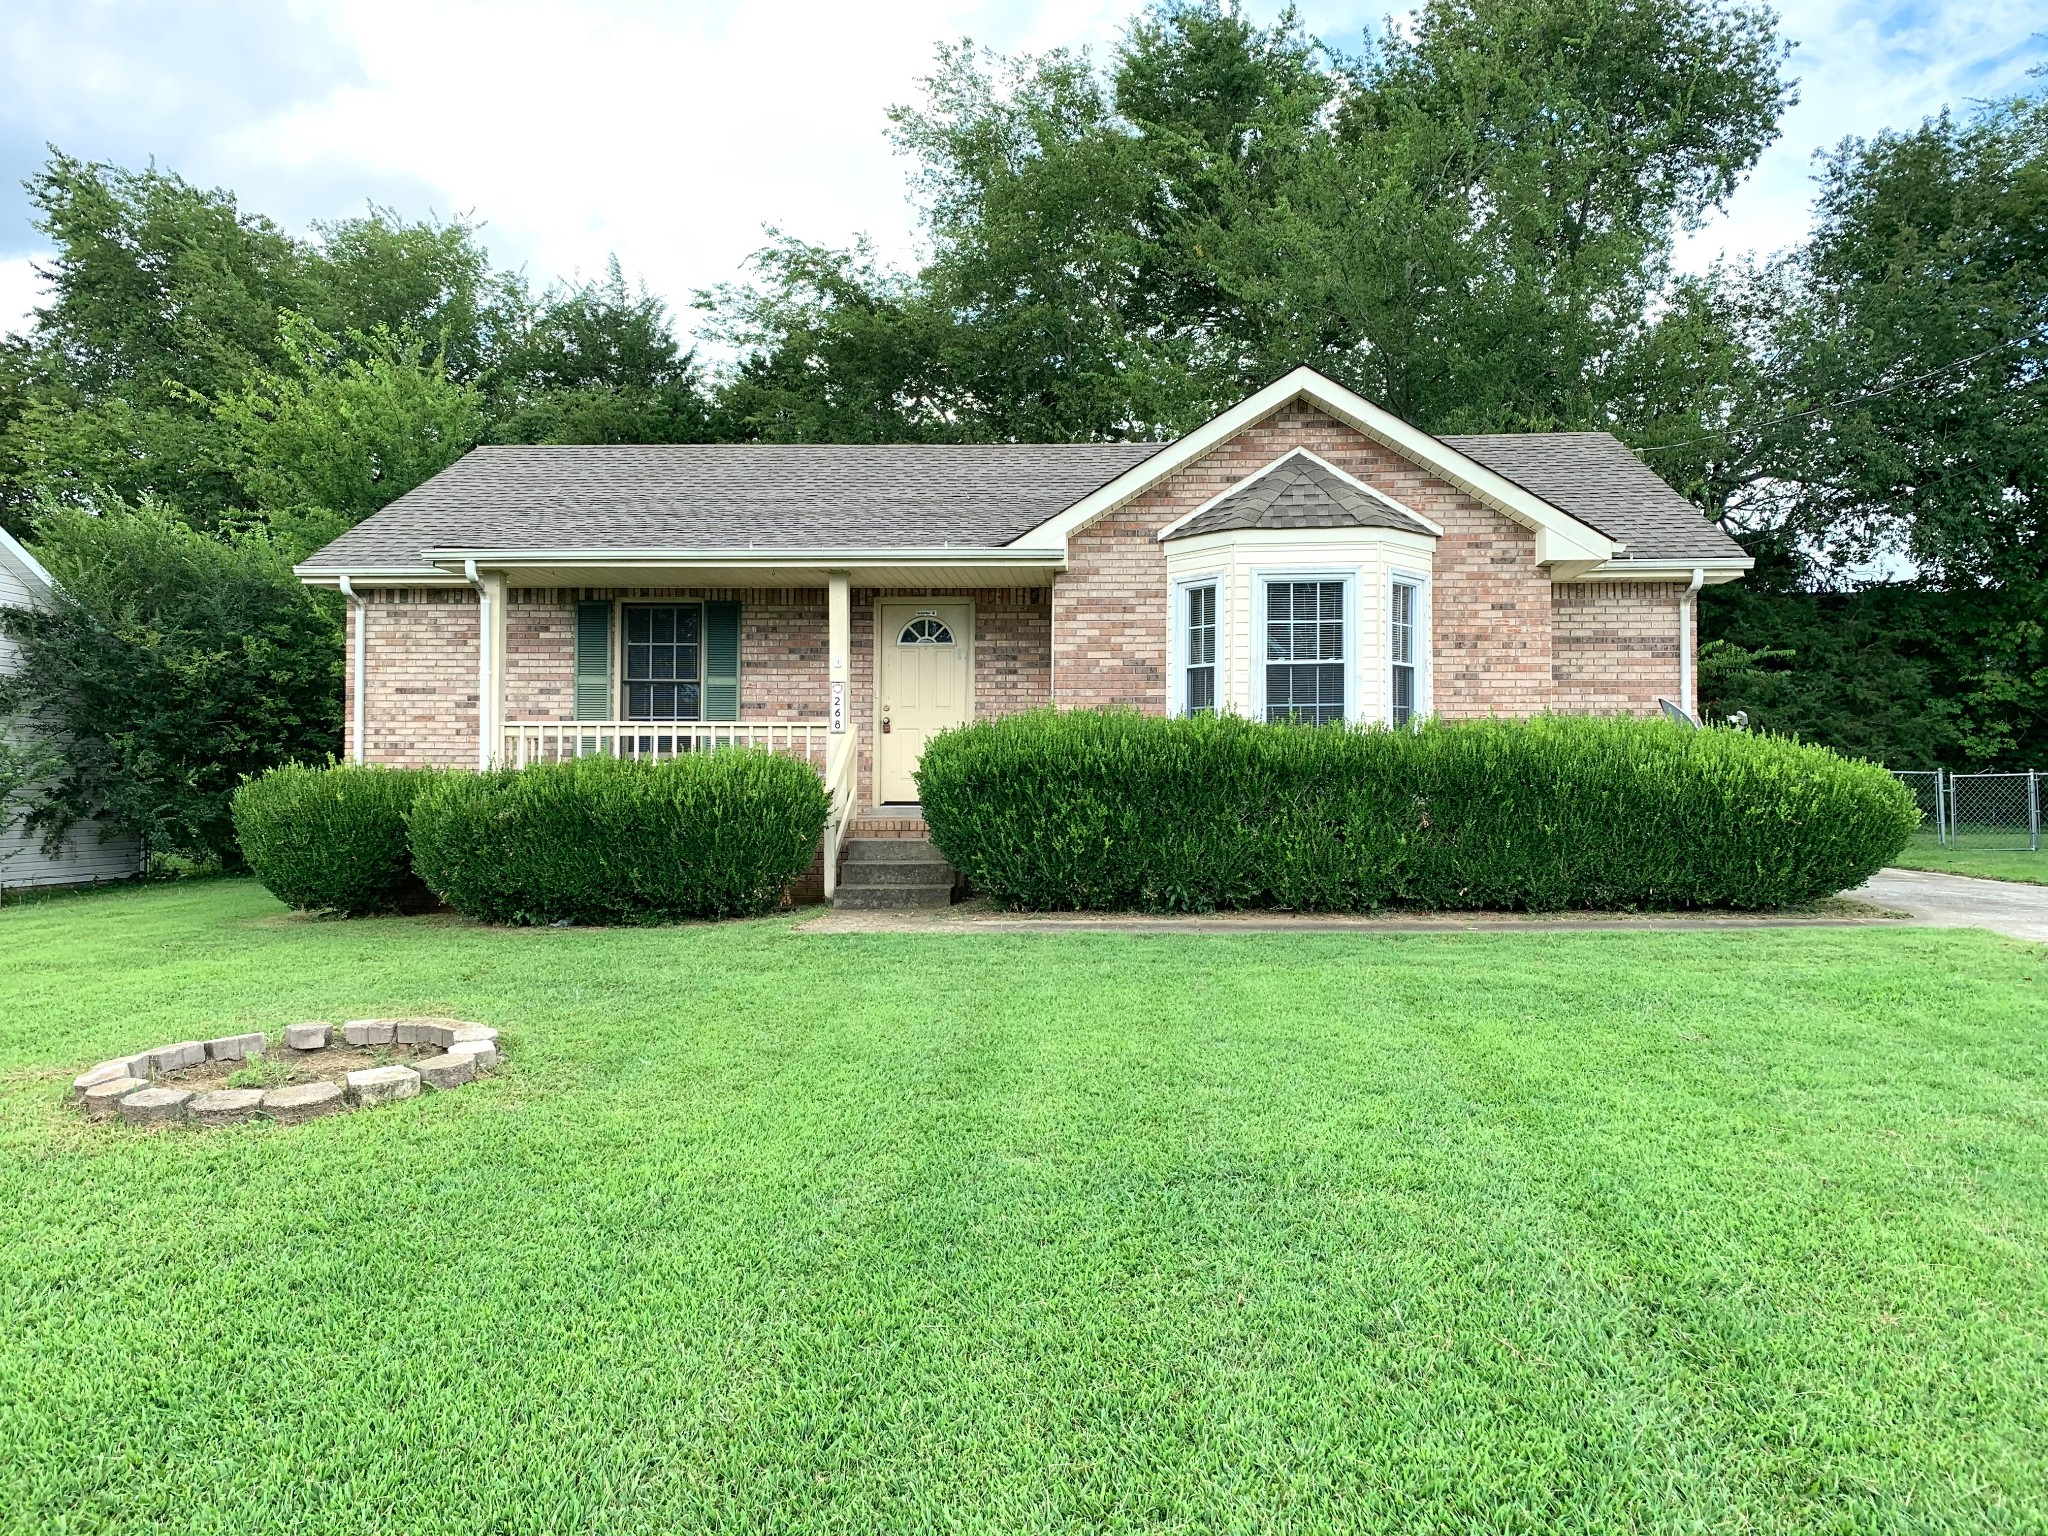 268 Moncrest Dr Property Photo - Clarksville, TN real estate listing